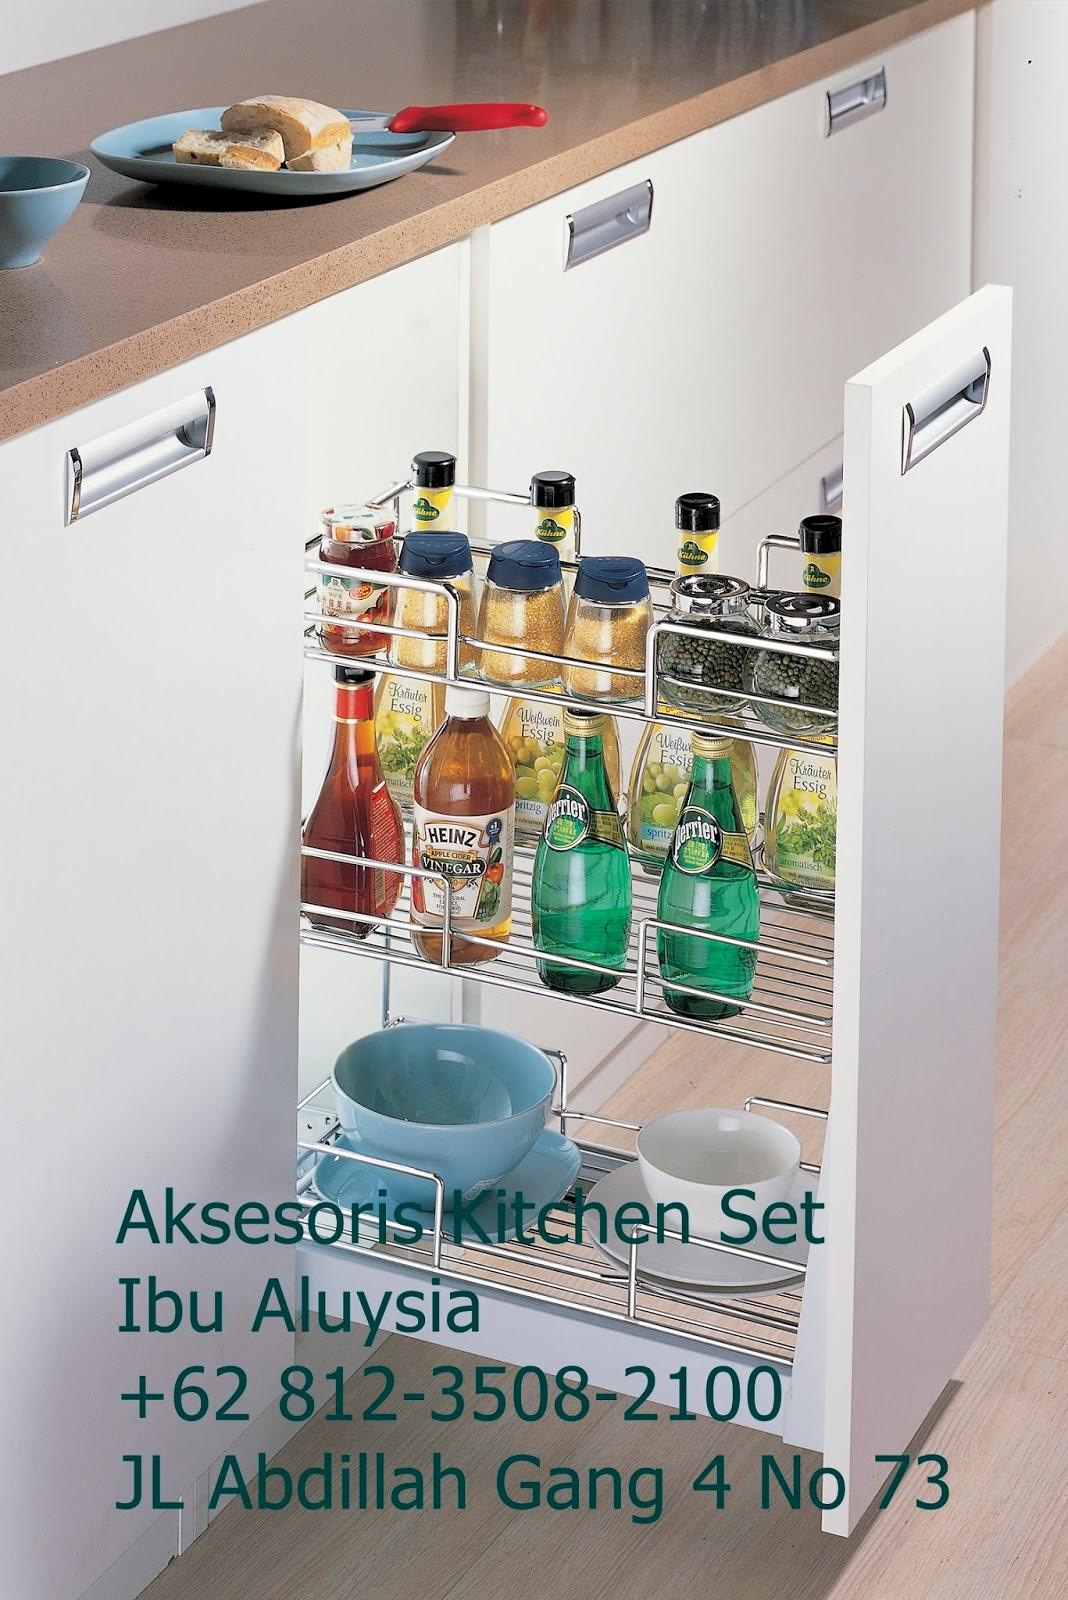 Semarang Kitchen Set Accessories